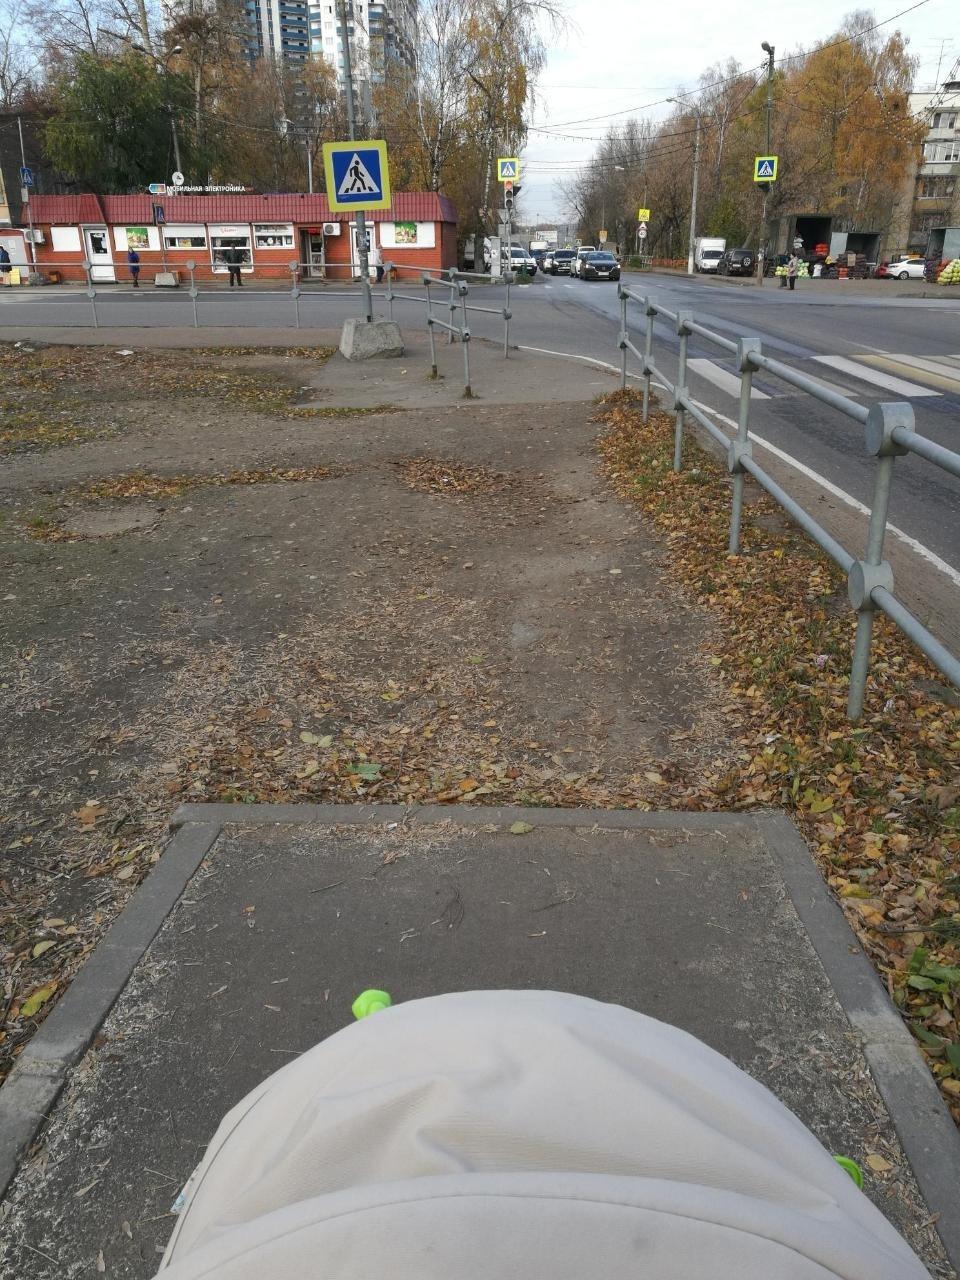 Тротуар в никуда на Тарасовской   #ПодслушаноВКоролёве #Королёв